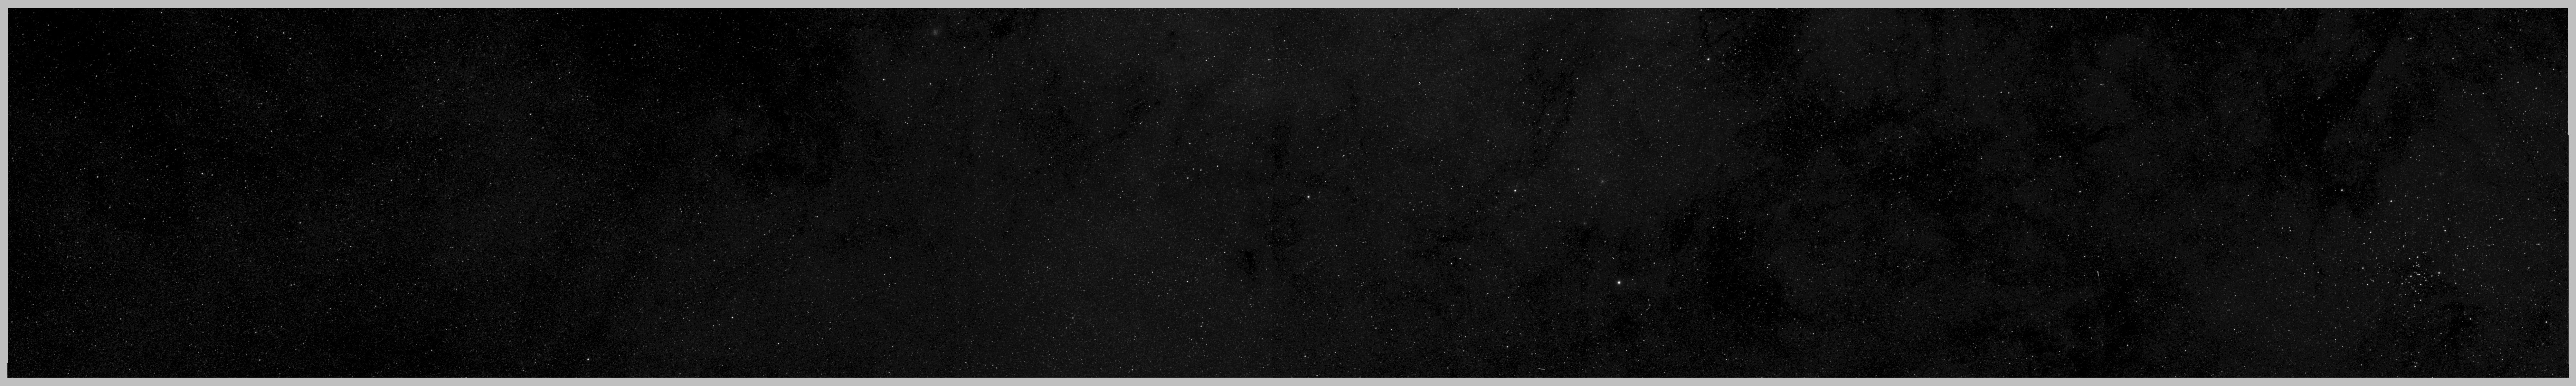 1567218990044-osiris_mosaic_orig.jpg